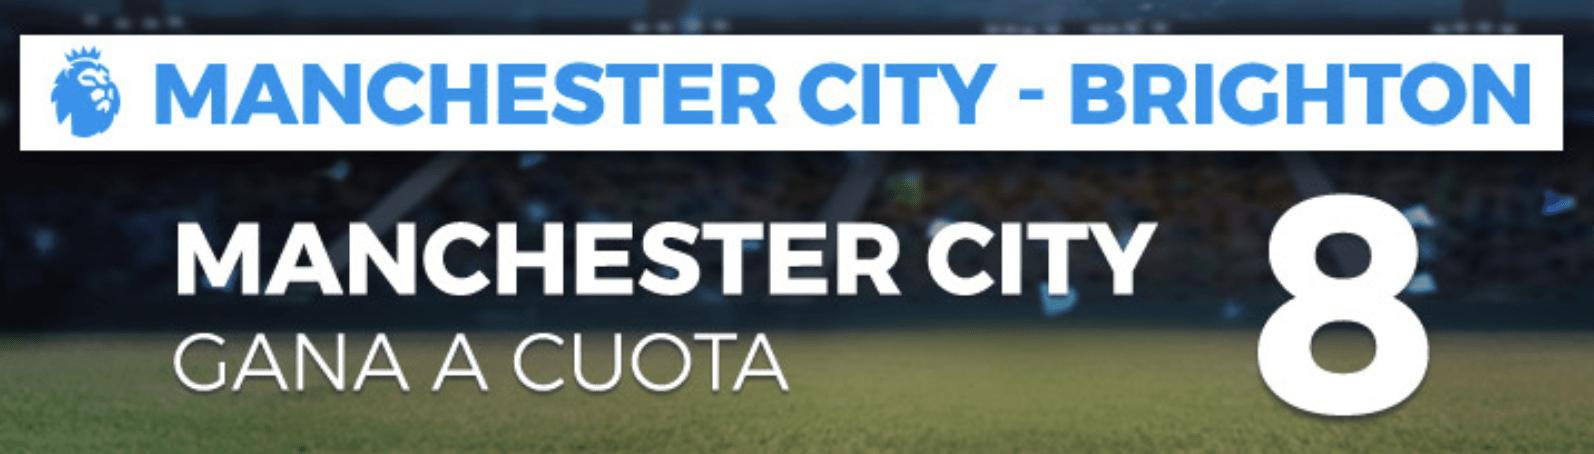 Supercuotas pastón Manchester City